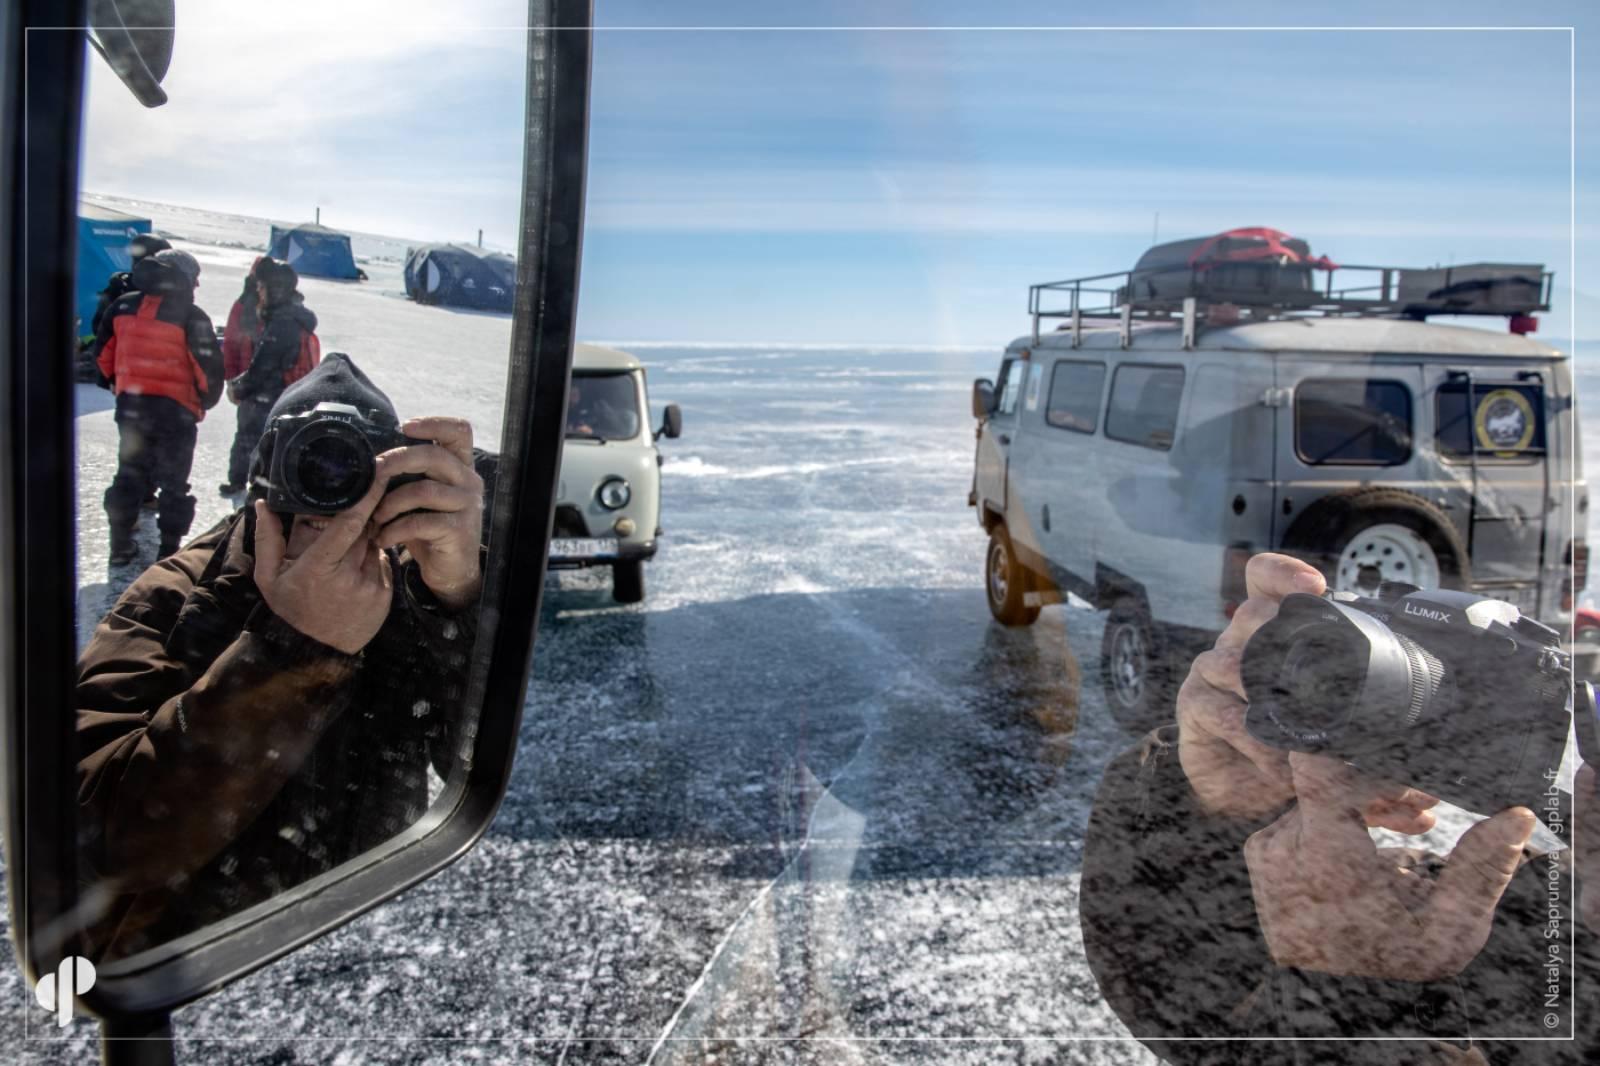 Test du Lumix GH5S sur le lac Baïkal ©️ Natalya Saprunova